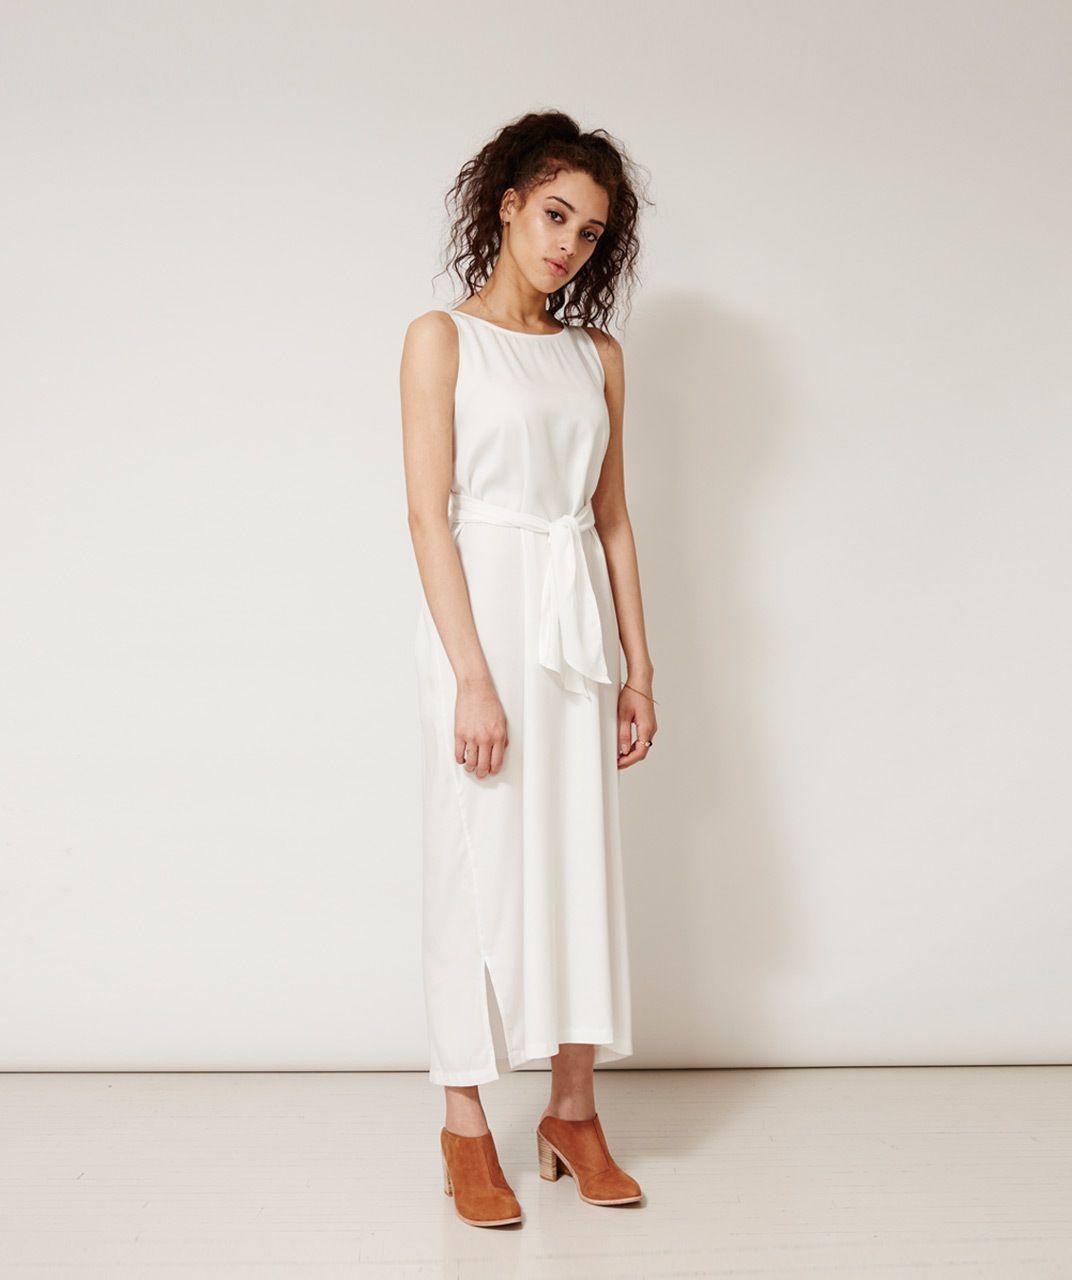 Shaina Mote, Tie Dress